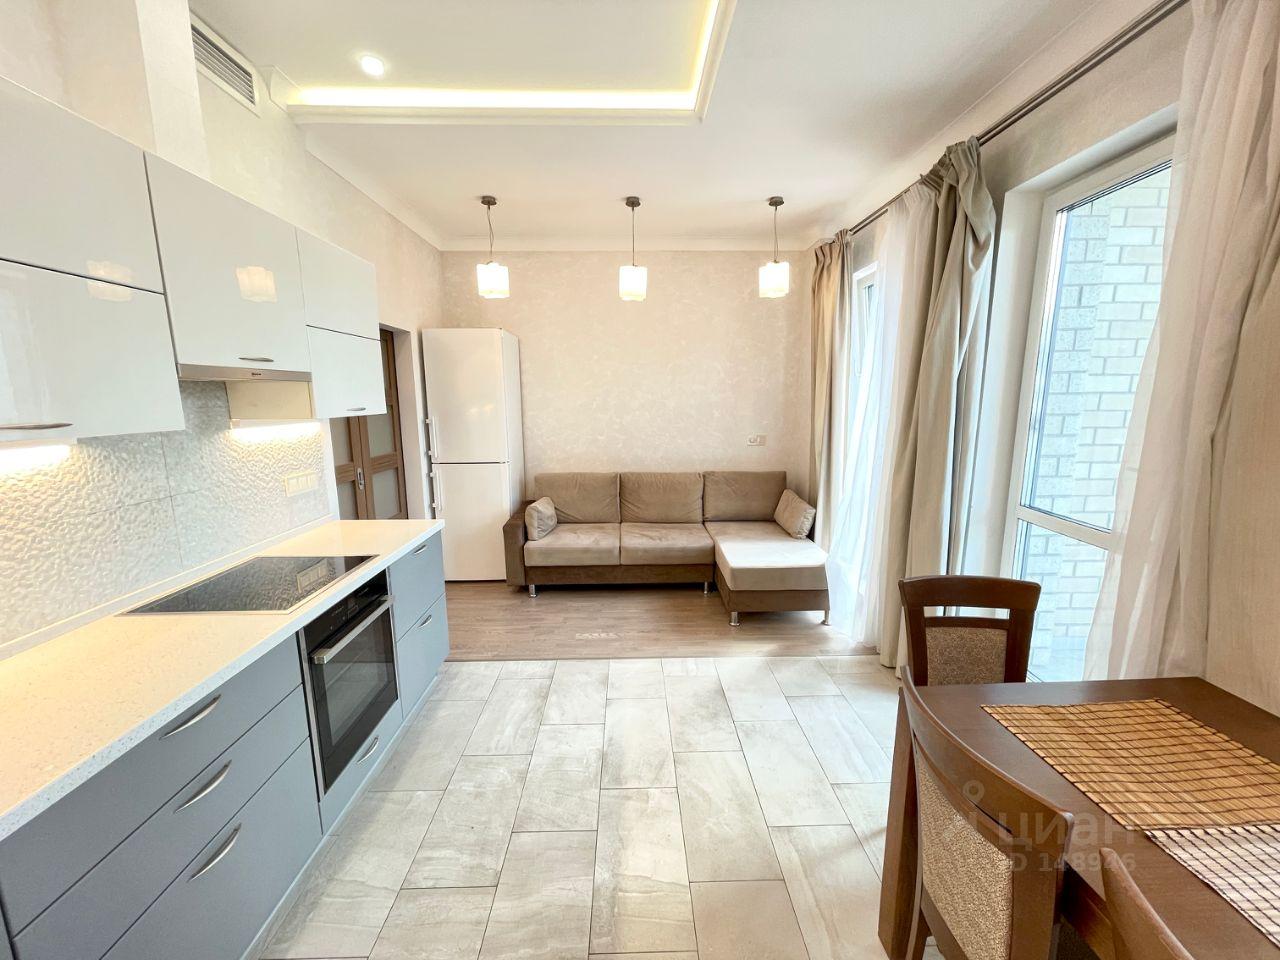 Продаю однокомнатную квартиру 58.4м² ул Клубная 8 Красногорск